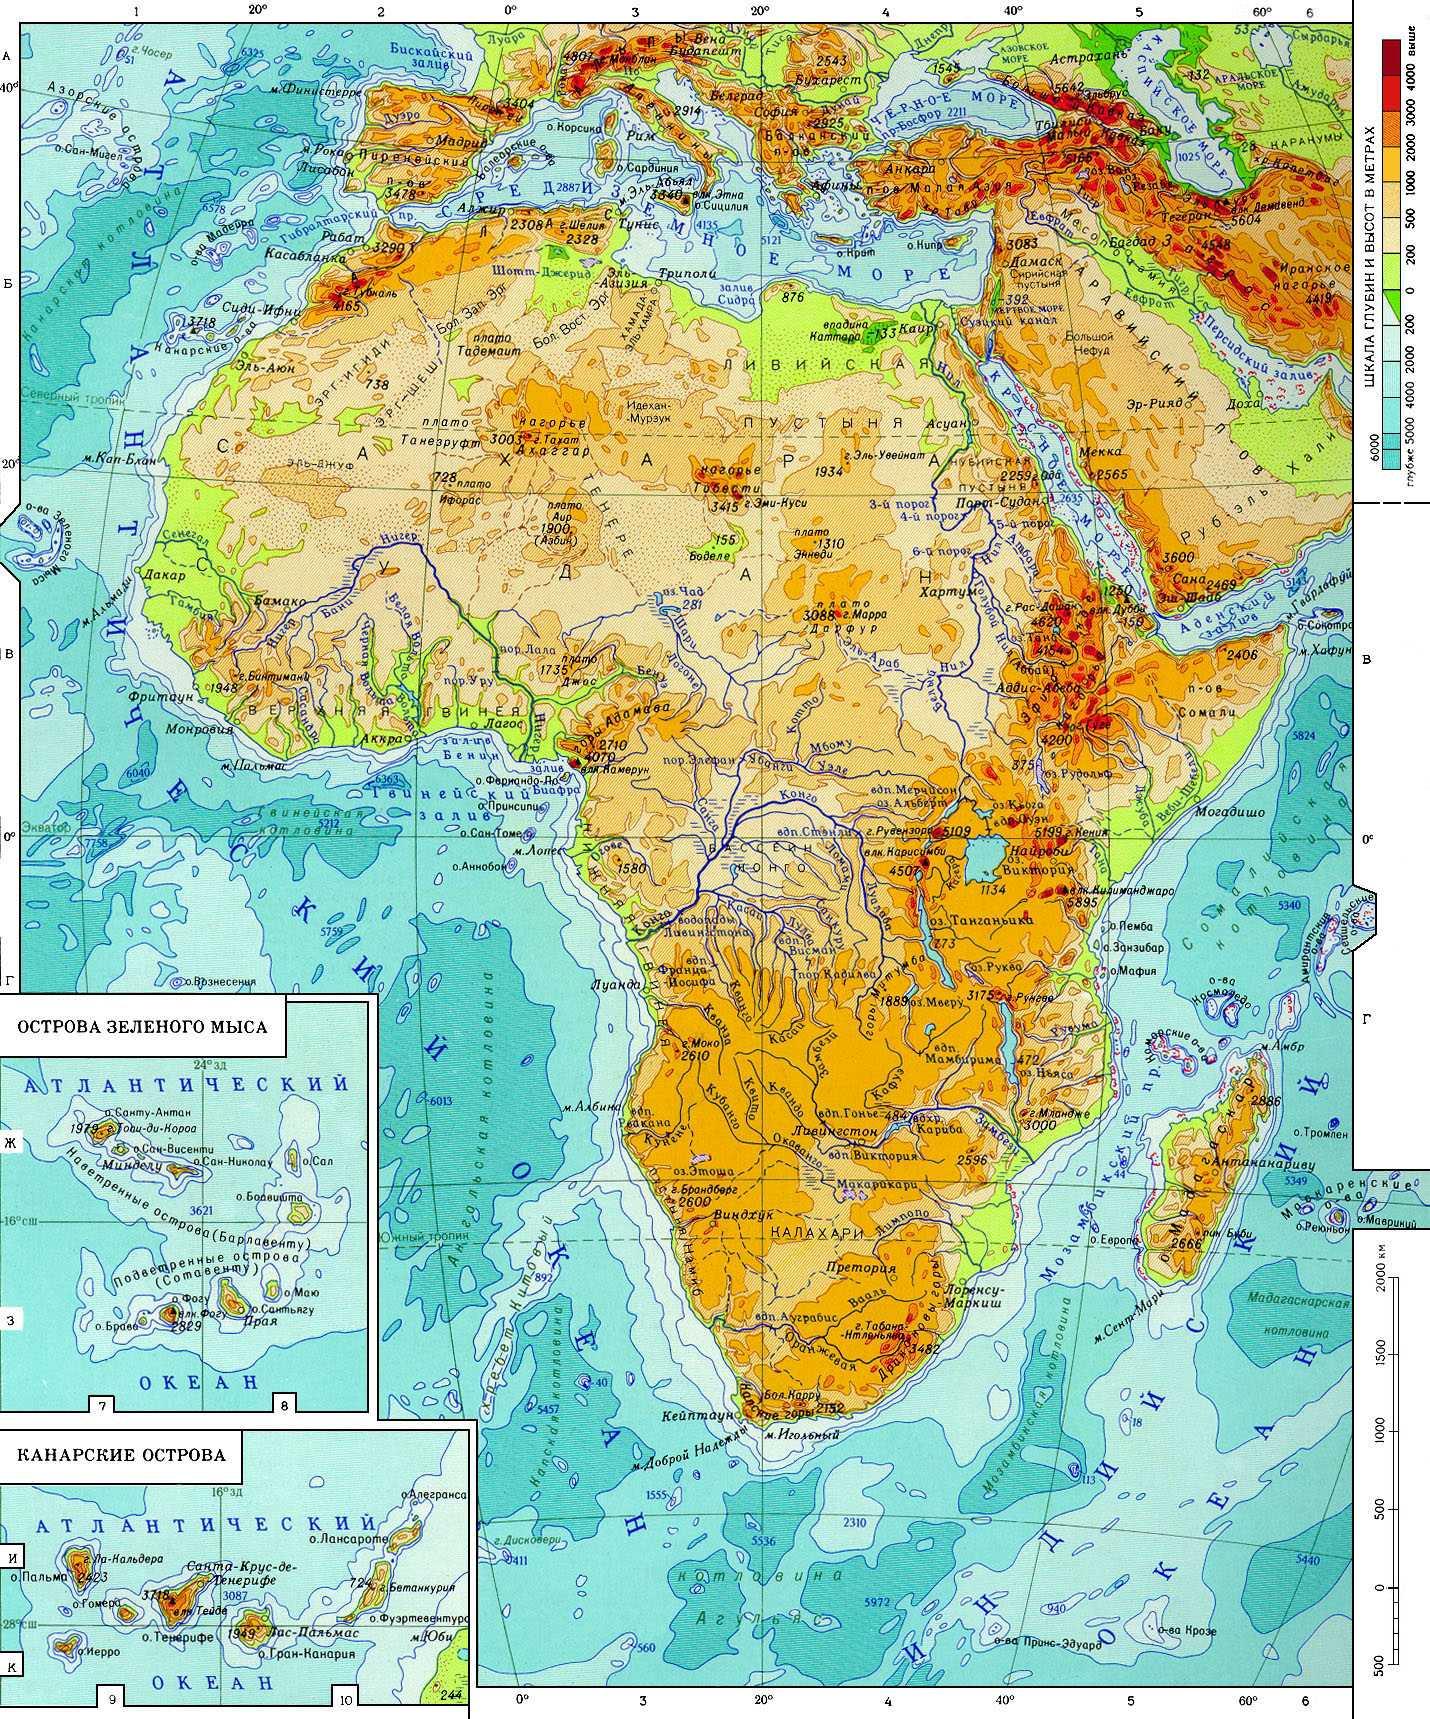 http://www.mapsmaps.ru/wp-content/uploads/2010/10/physic_africa2.jpg